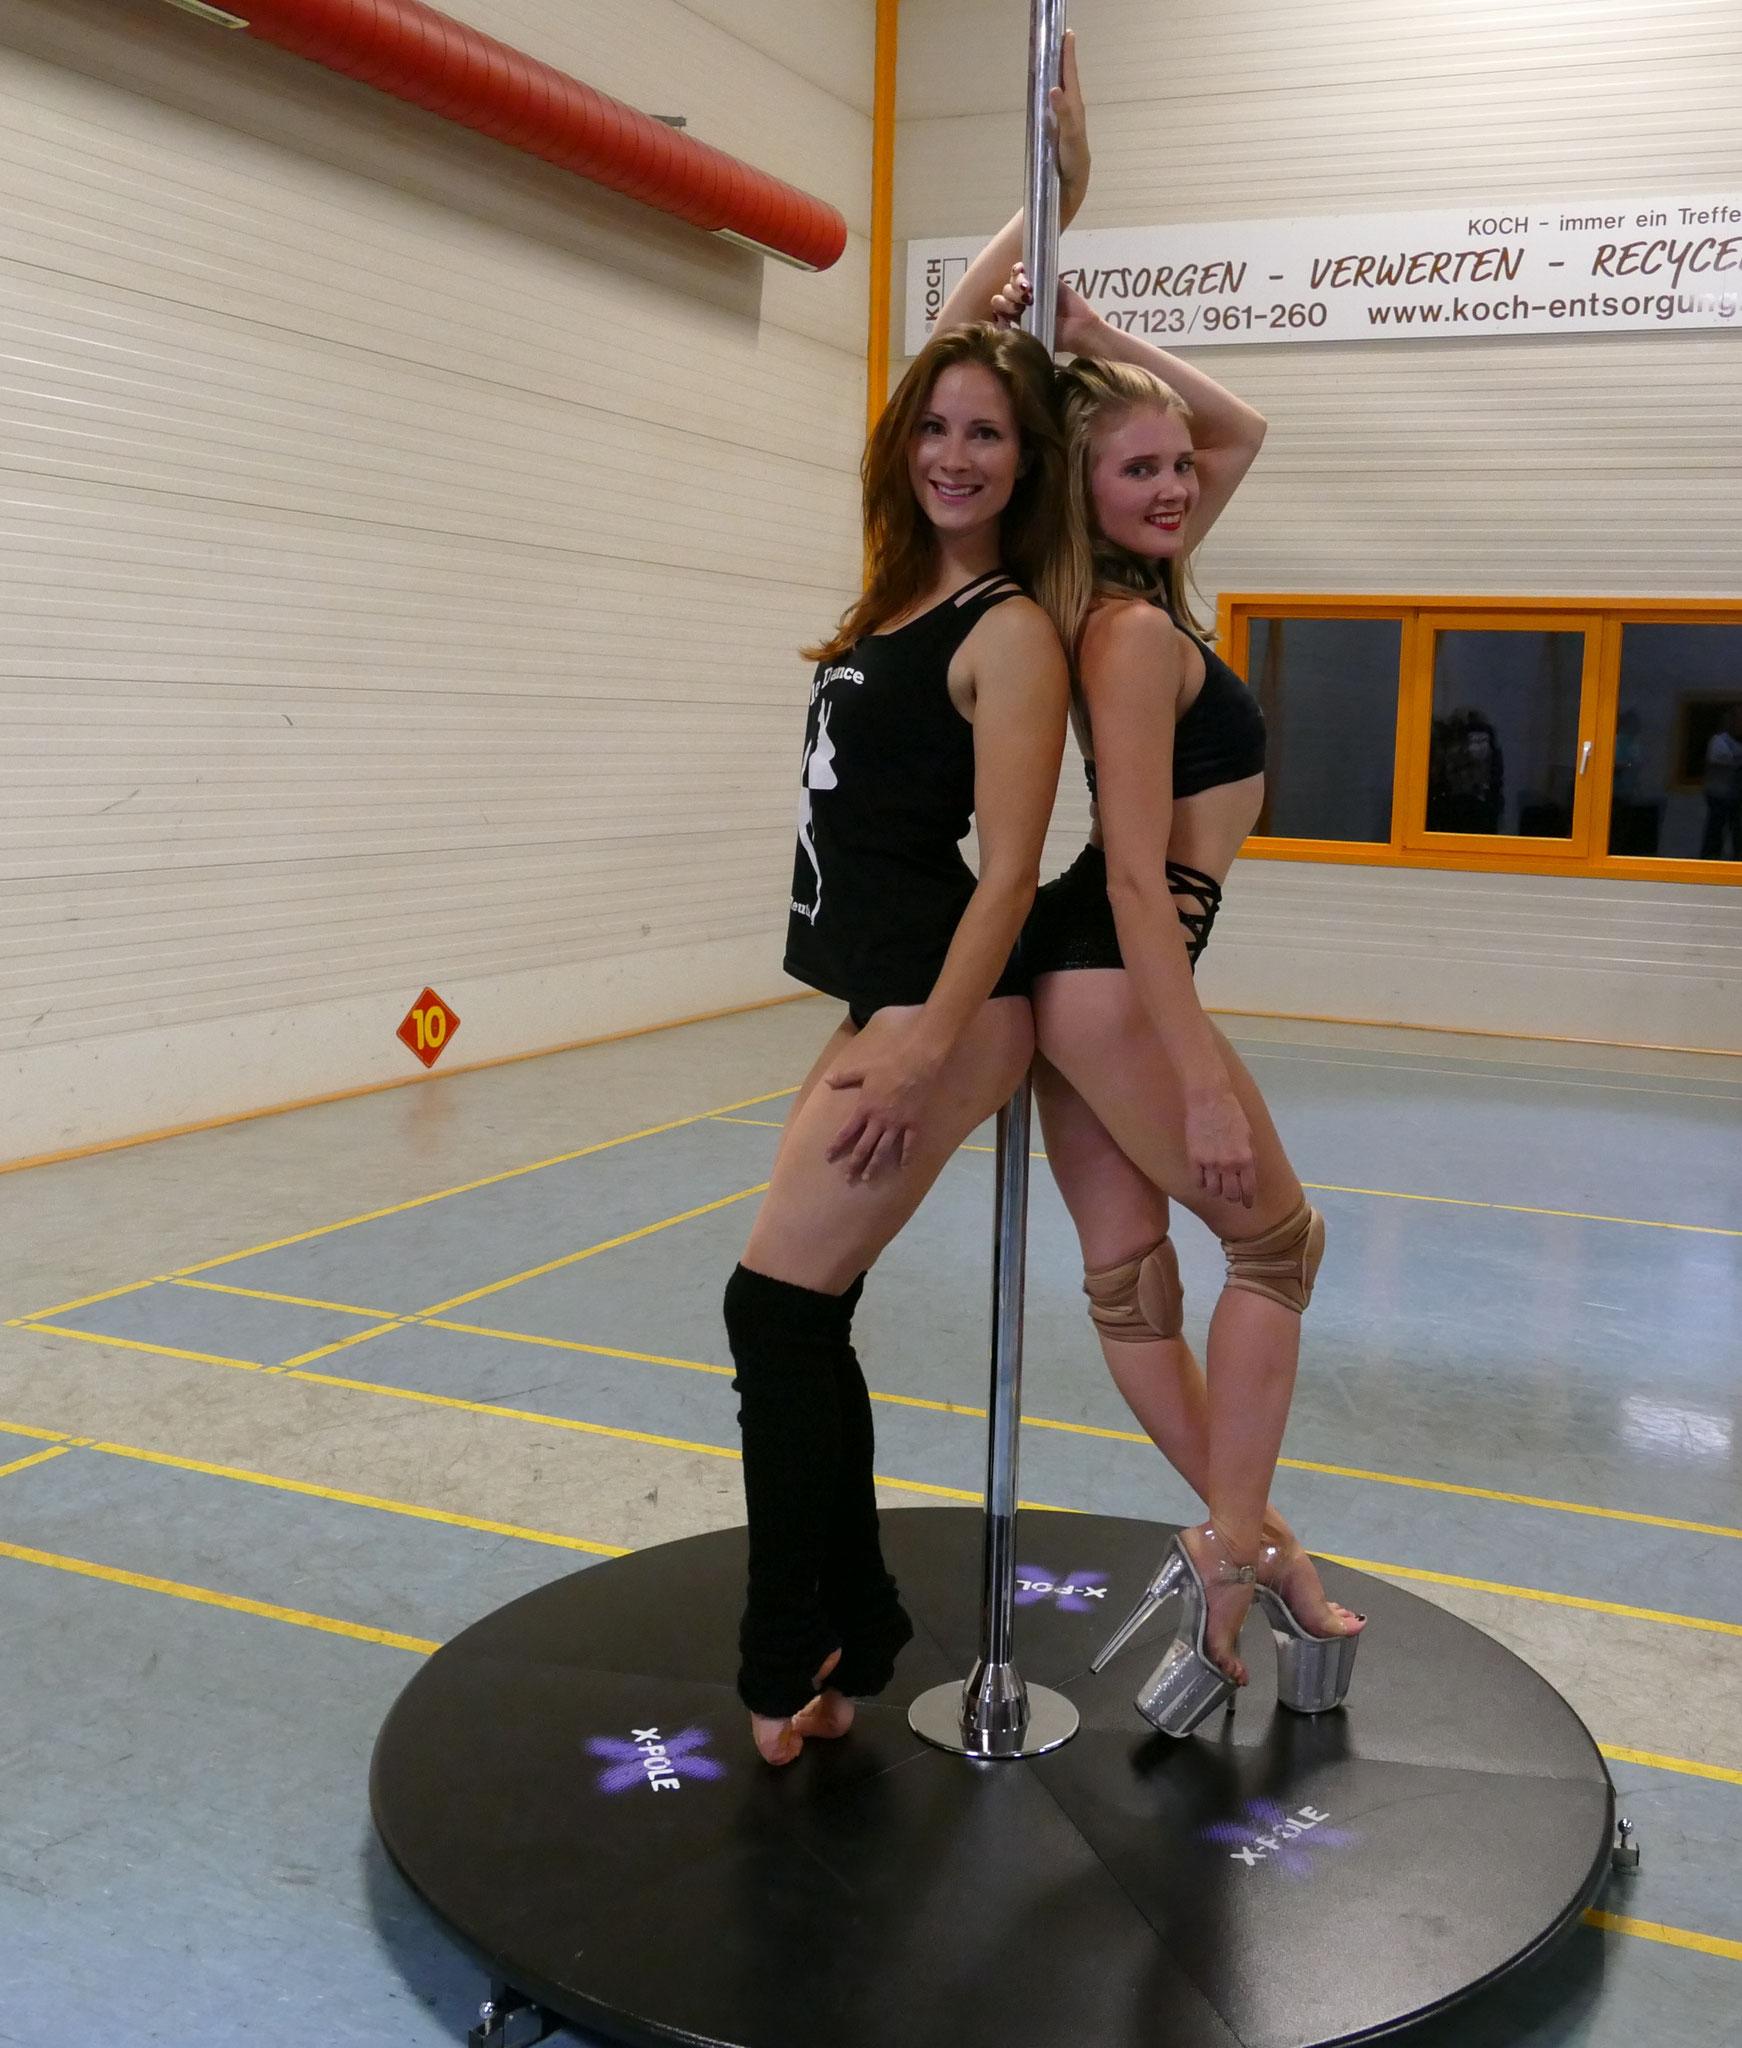 Olga Spezia und Stefanie Riehle